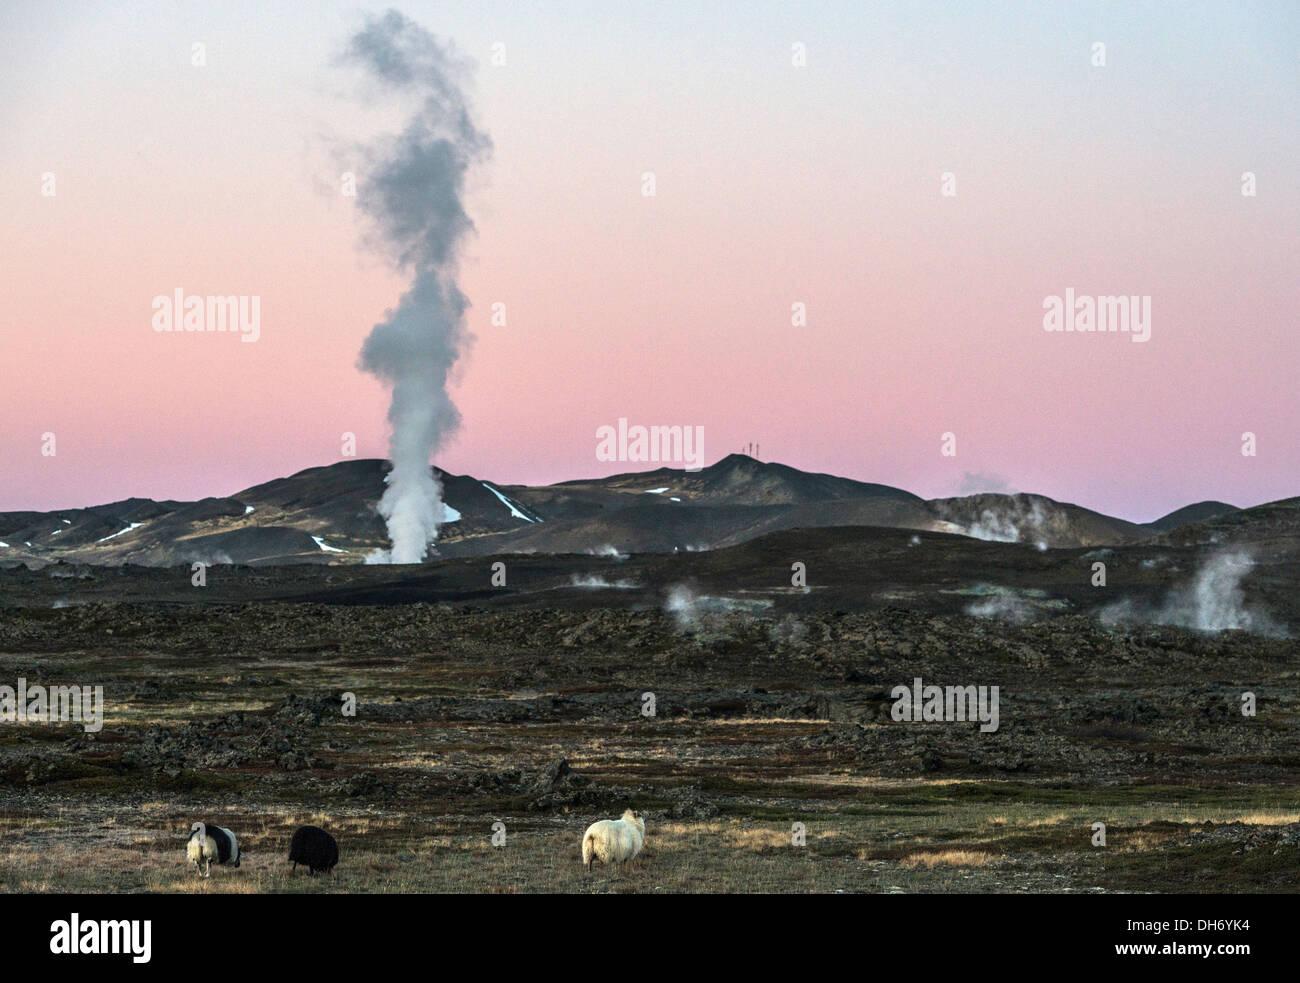 Icelandic sheep and Mudpot or mud pool North Iceland - Stock Image